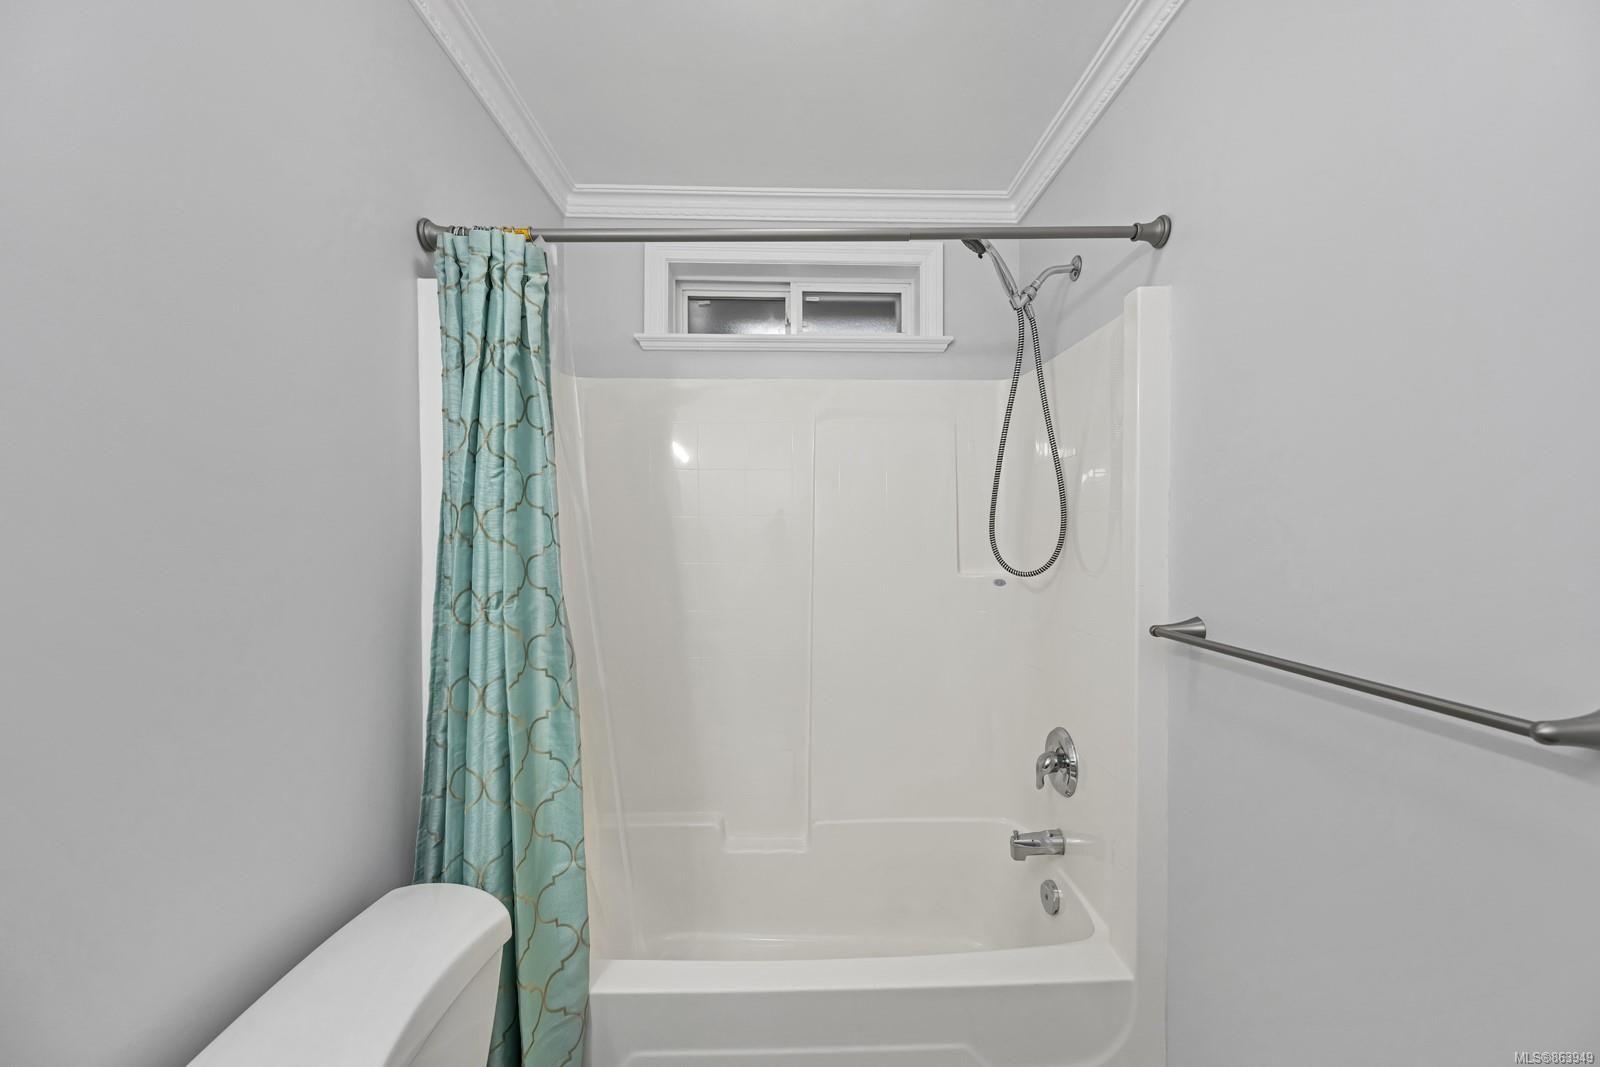 Photo 17: Photos: 6154 Sayward Rd in : Du West Duncan Half Duplex for sale (Duncan)  : MLS®# 863949